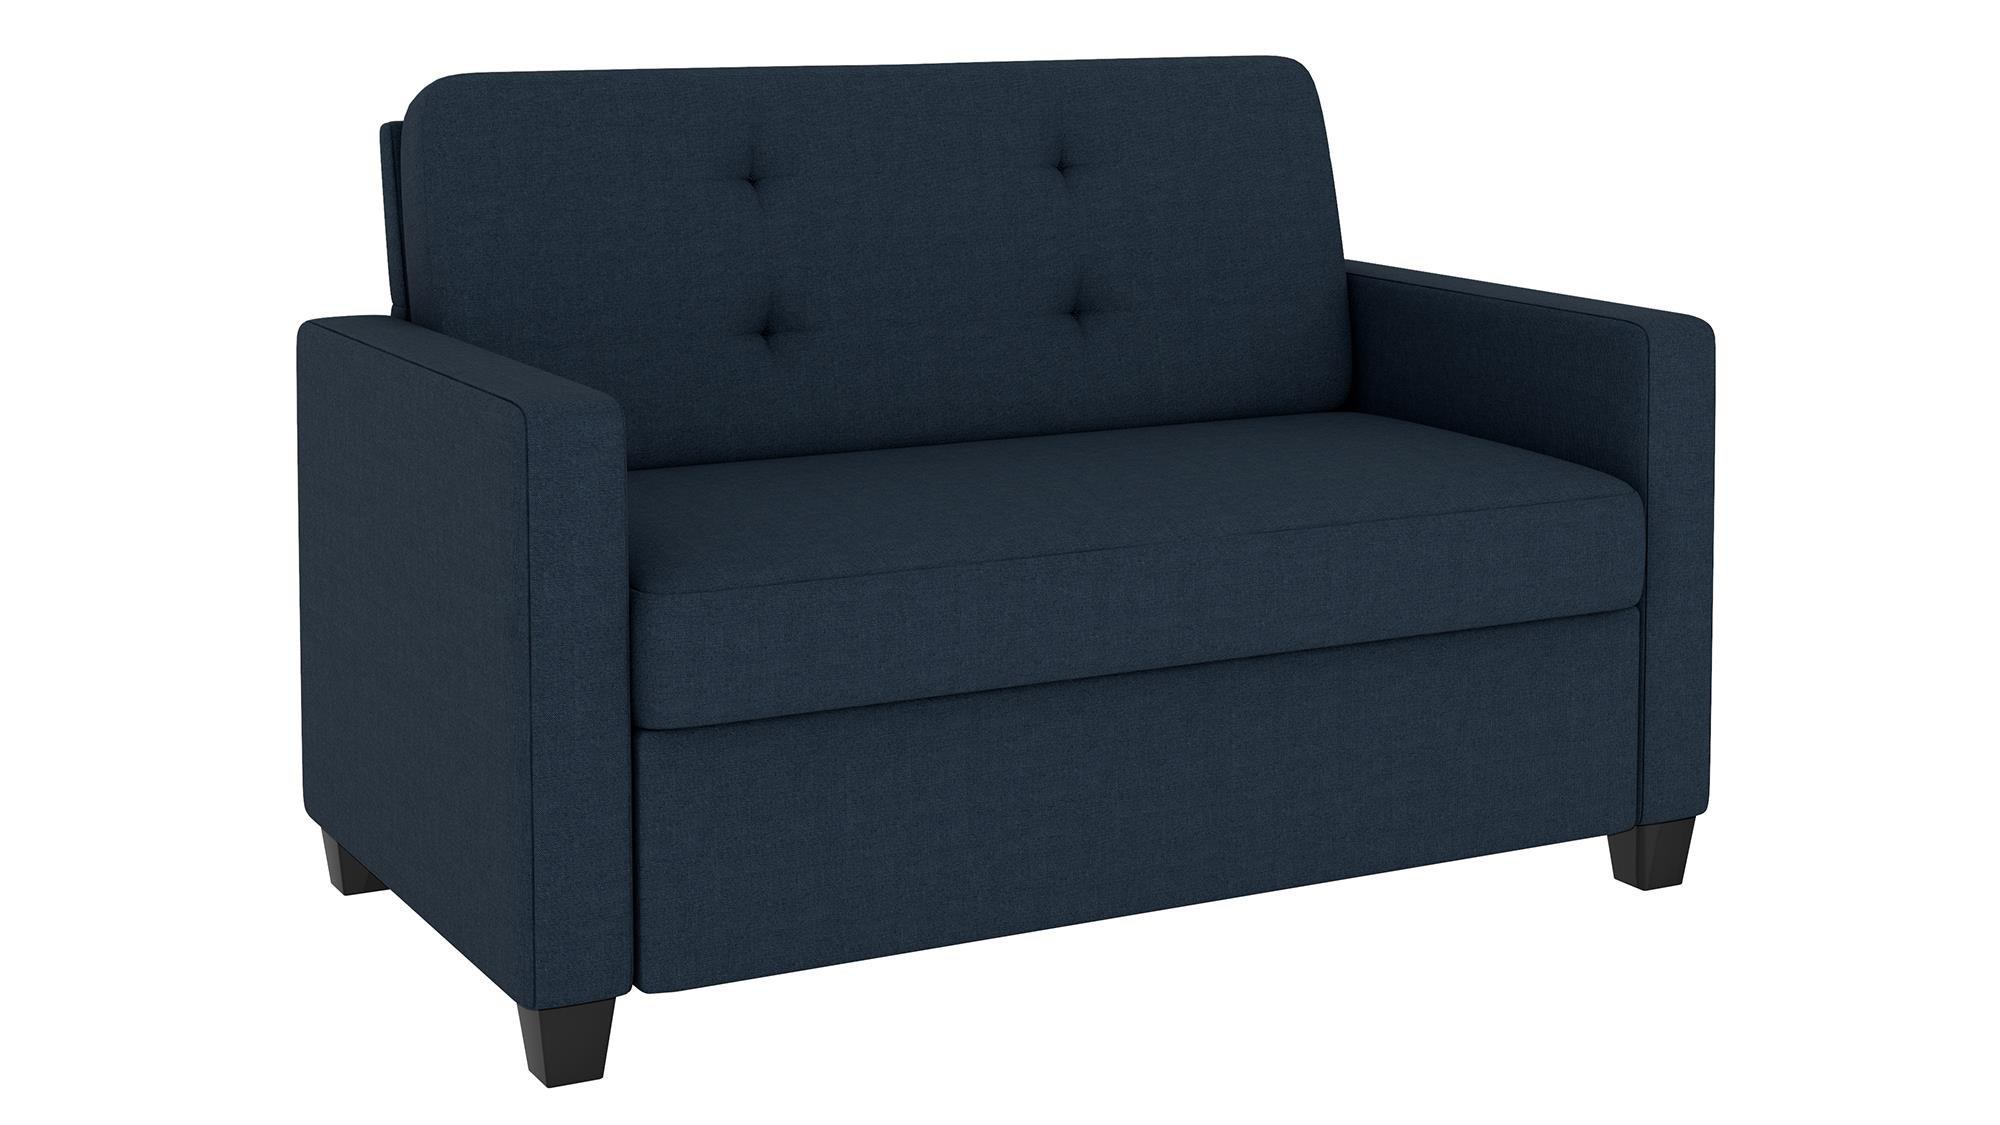 Signature Sleep Devon Sleeper Sofa with Memory Foam Mattress, Blue Linen, Twin by Signature Sleep